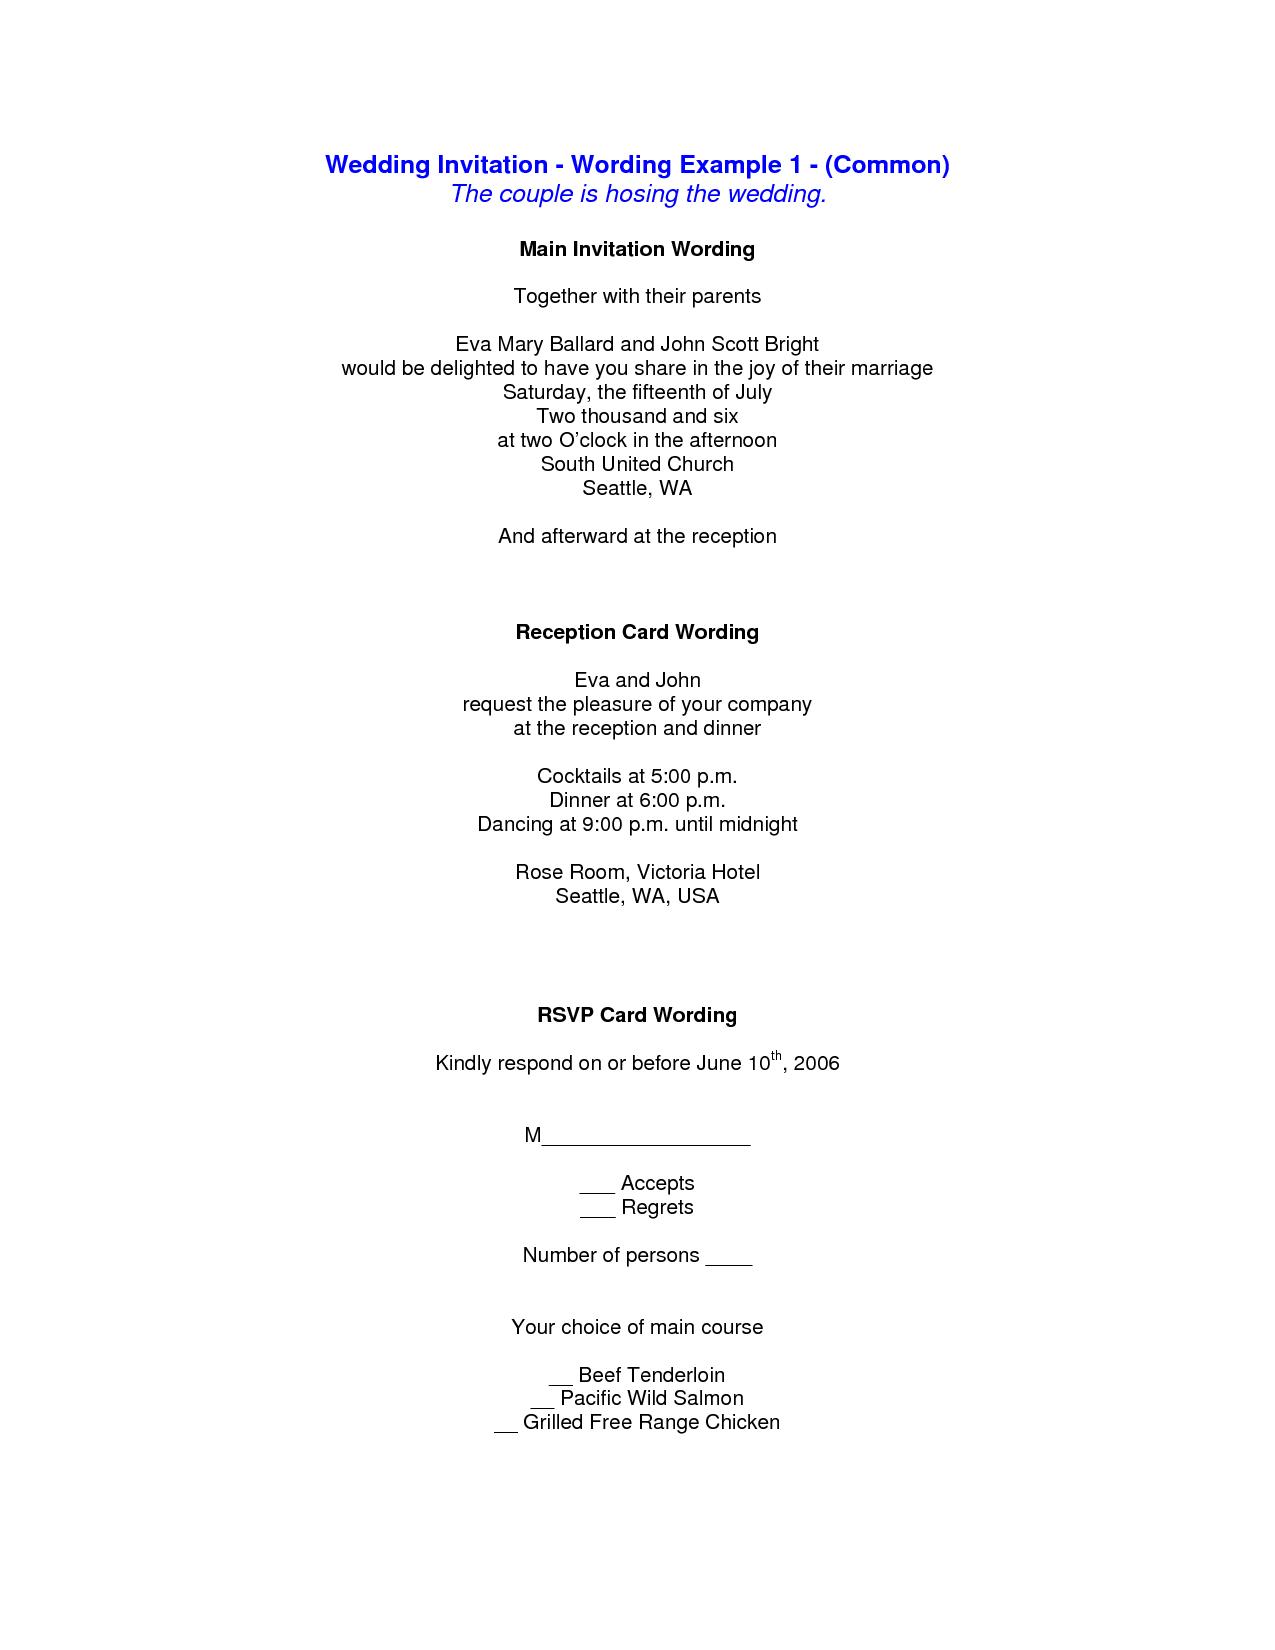 Post Wedding Reception Invitation Wording Samples